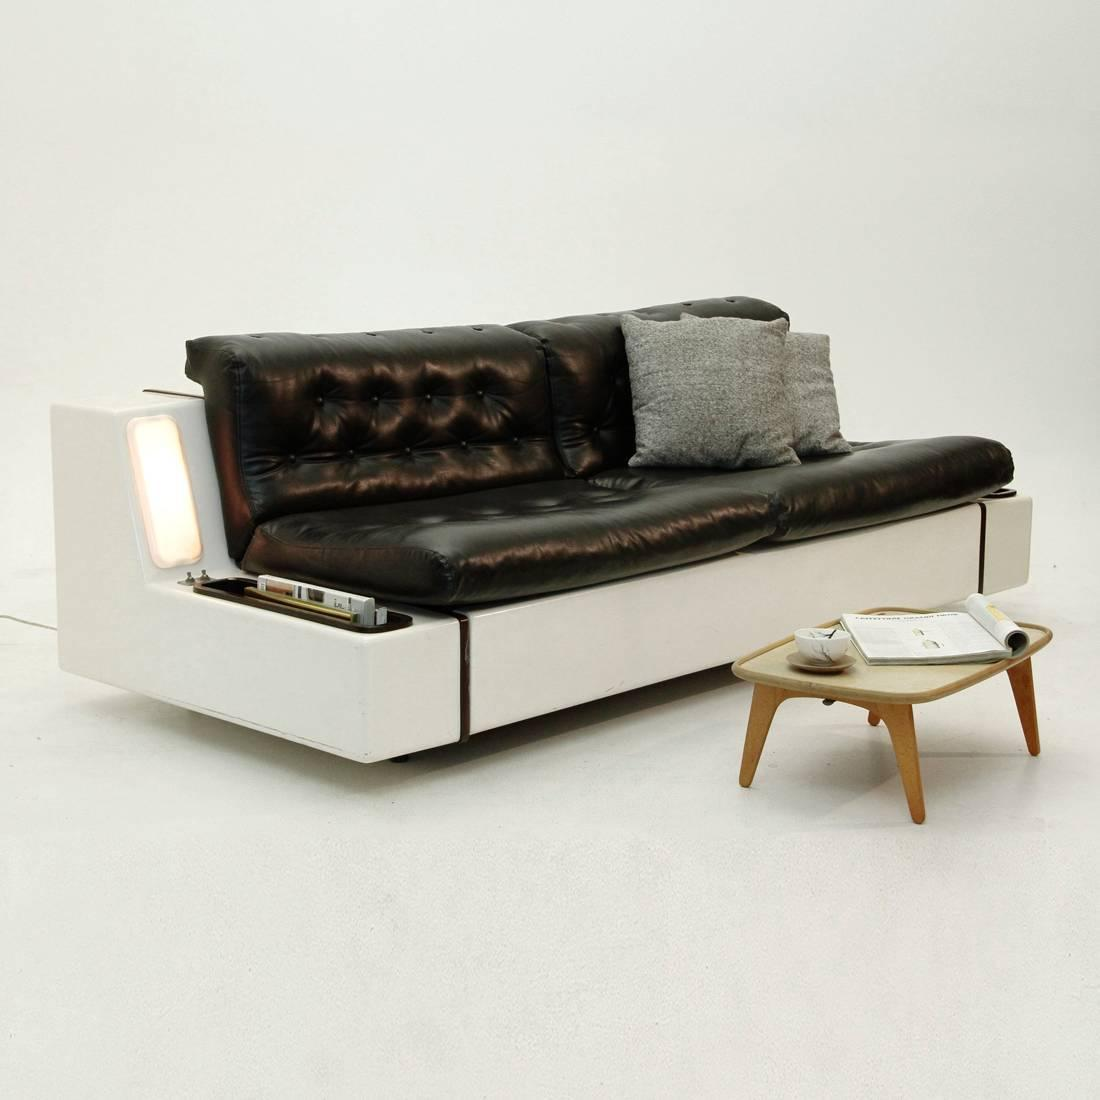 Mid-Century Italian Sofa Bed, 1960s At 1stdibs